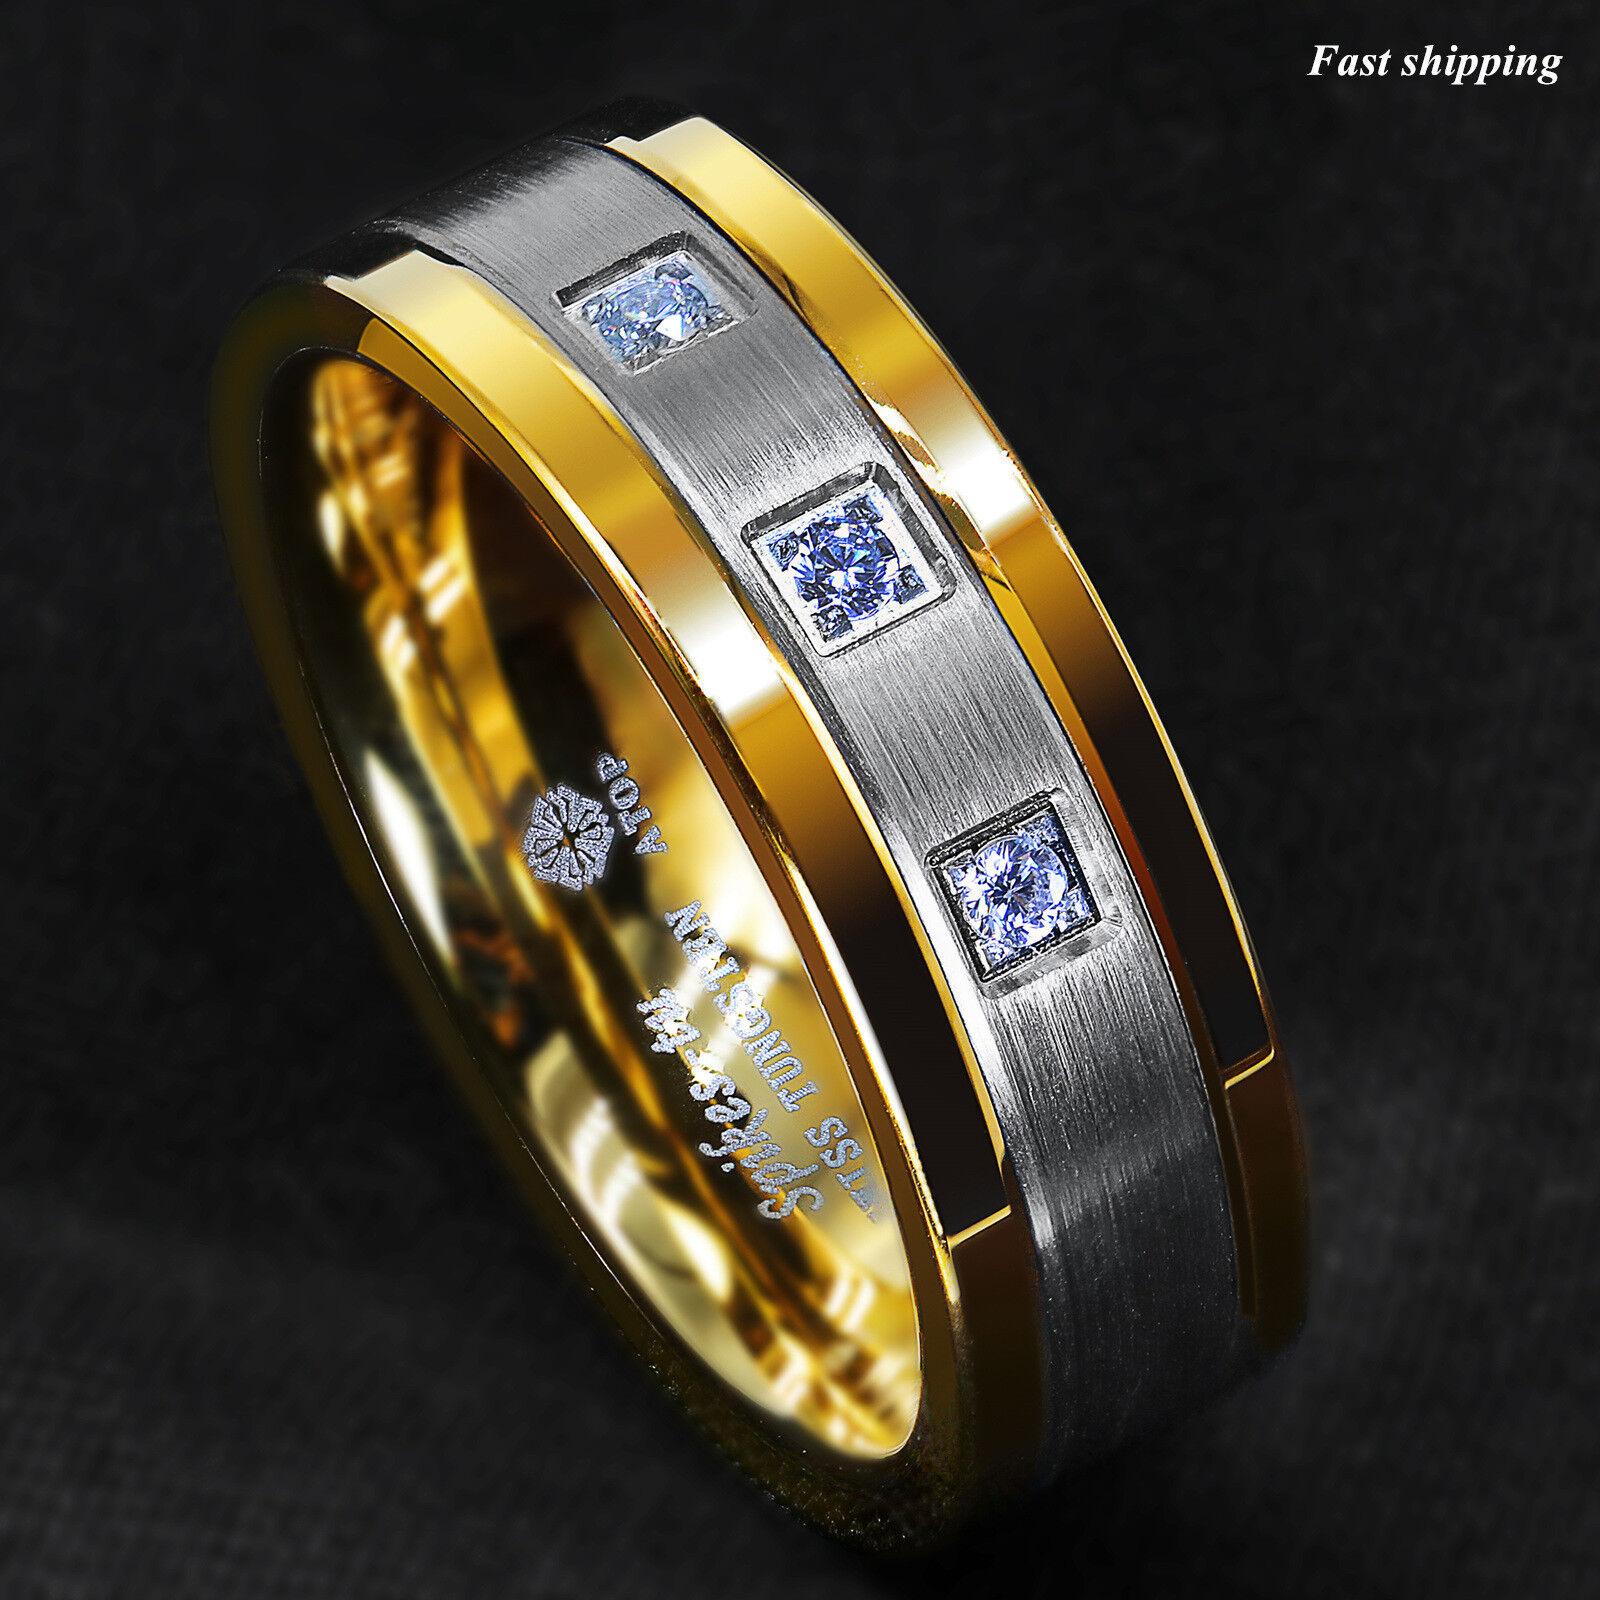 Tungsten Carbide ring rose gold black brushed Wedding Band Ring men's jewelry